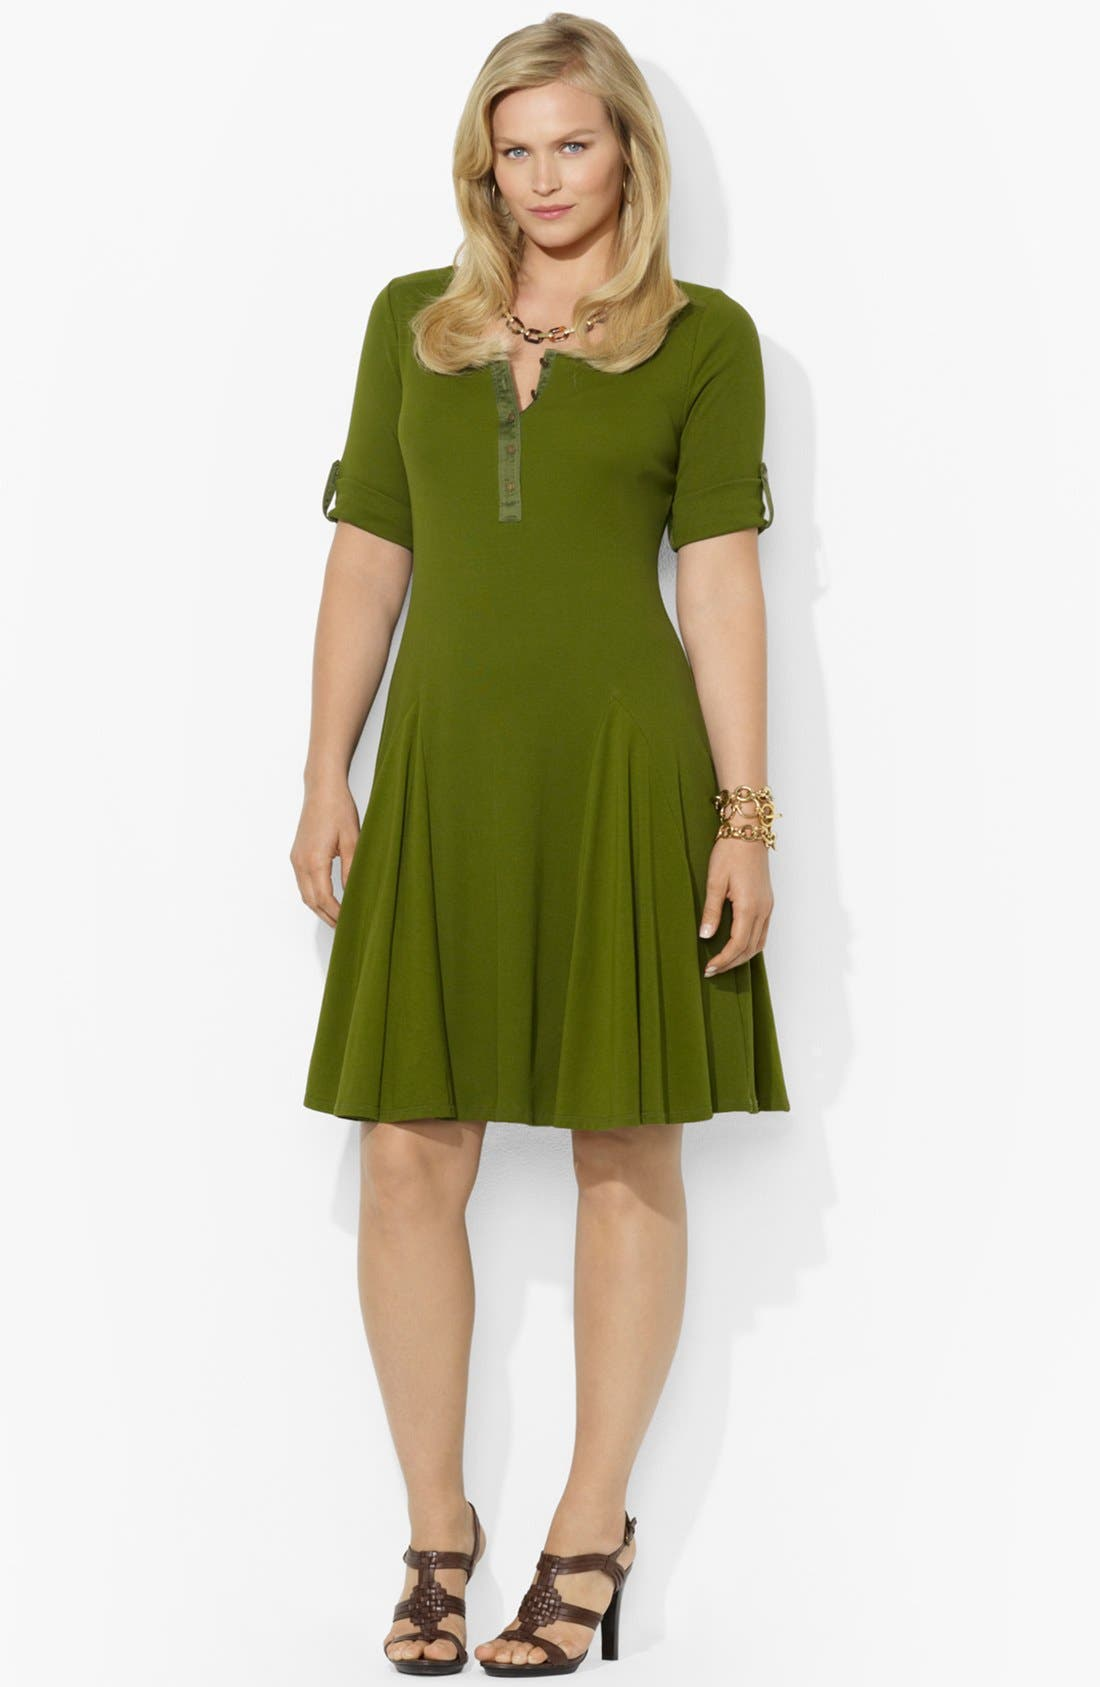 Alternate Image 1 Selected - Lauren Ralph Lauren Henley Fit & Flare Dress (Plus Size)